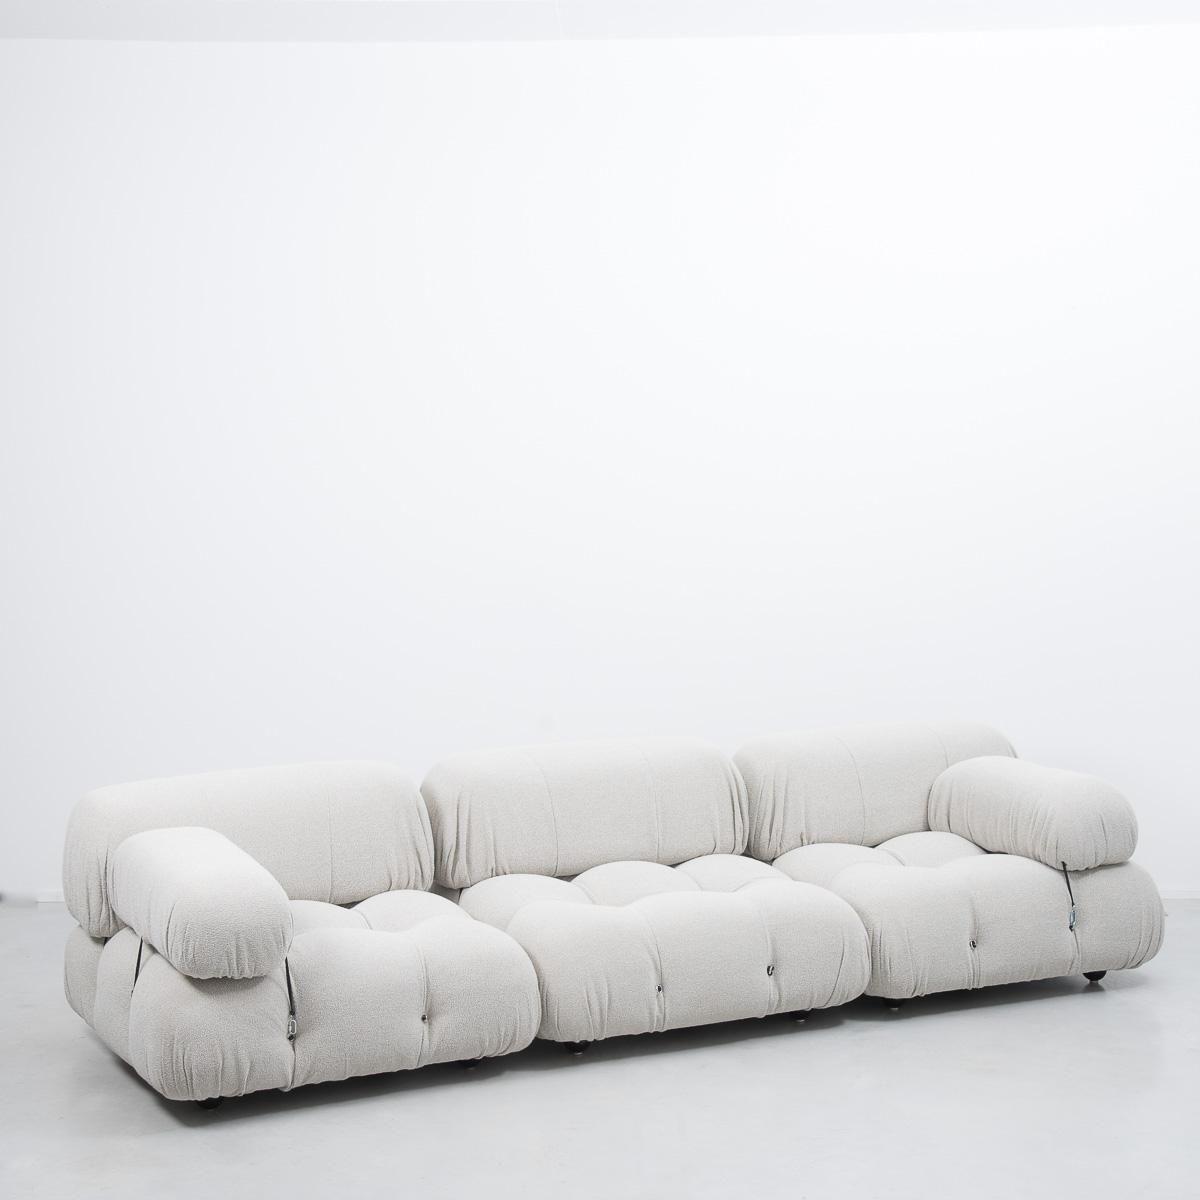 Camaleonda Three Seater Modular Sofa By Mario Bellini For B B Italia 1970s 1 Modern Sofa Designs Modular Sofa Sofa Design